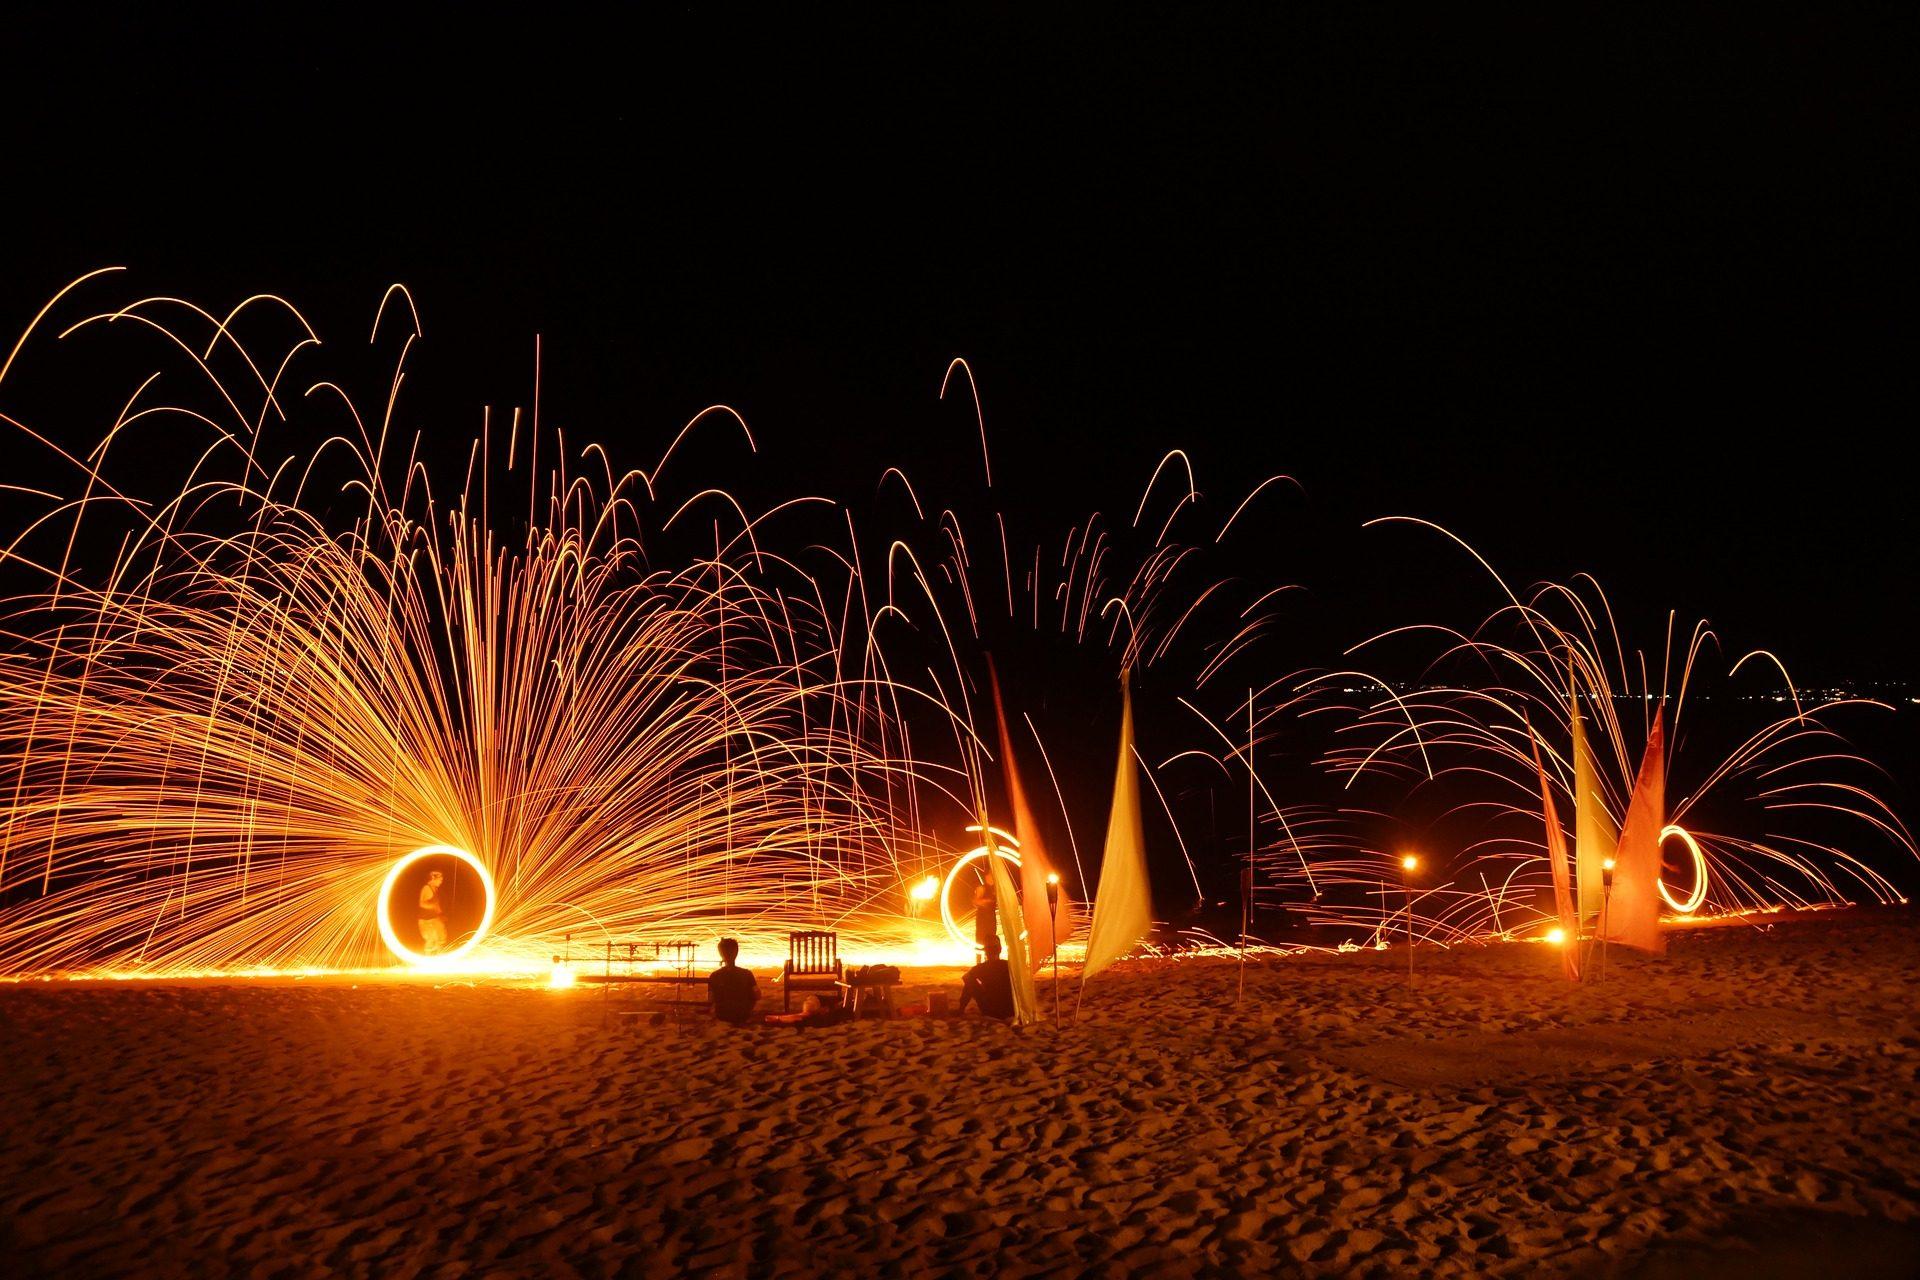 incêndios, espectáculos, Sparks, luzes, Praia, Tailândia - Papéis de parede HD - Professor-falken.com